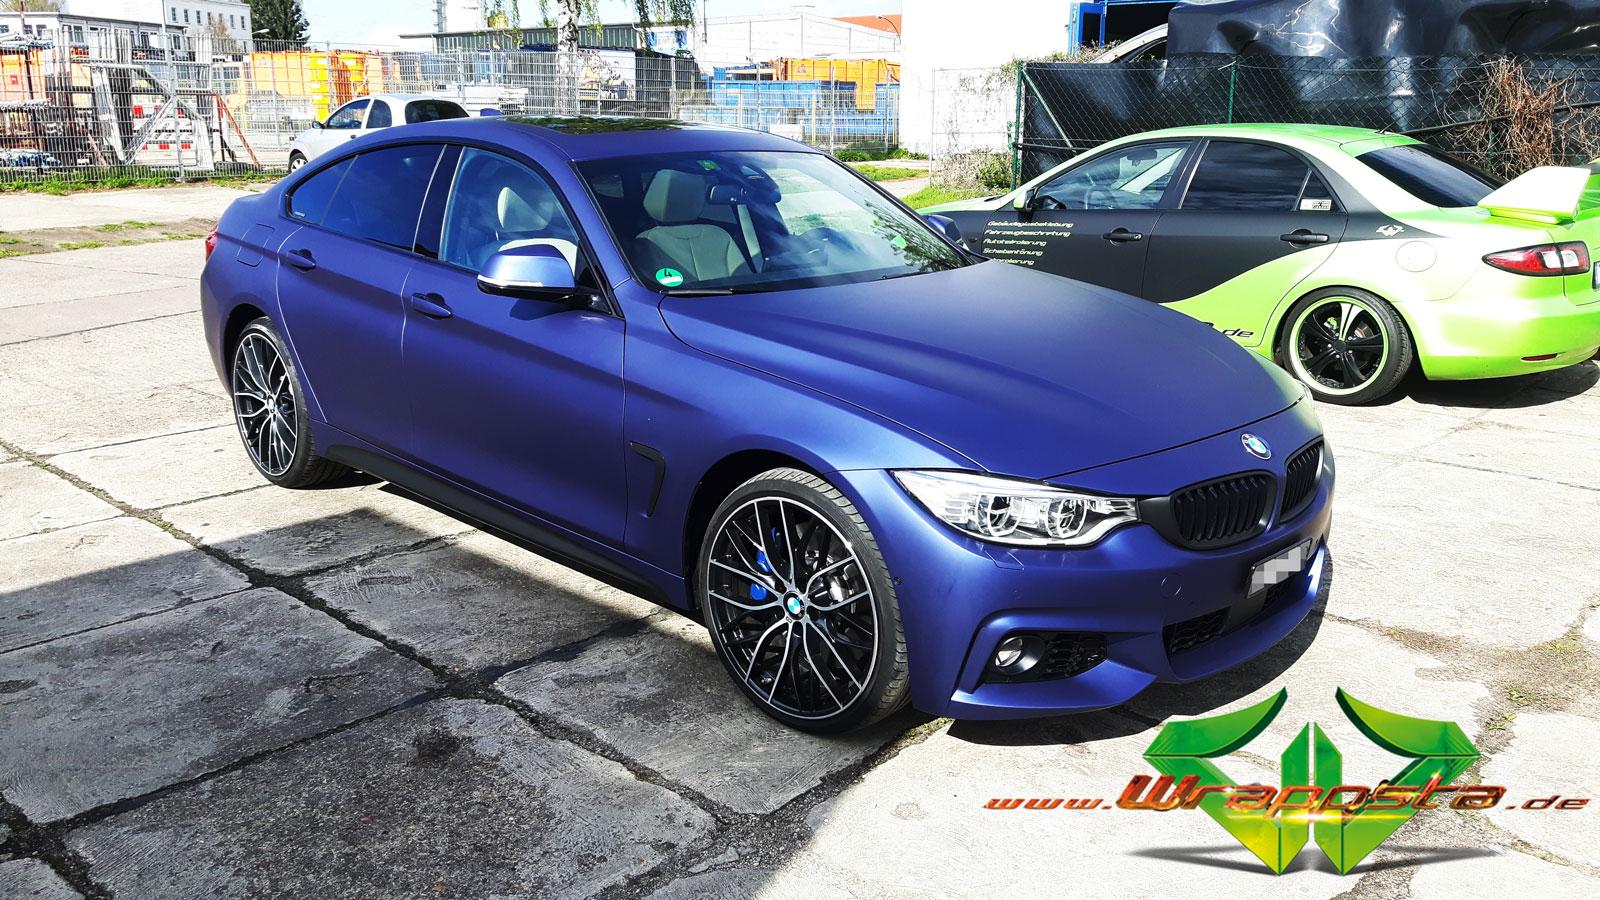 Bmw 435 Grand Coupe Matte Metallic Night Blue Wrappsta